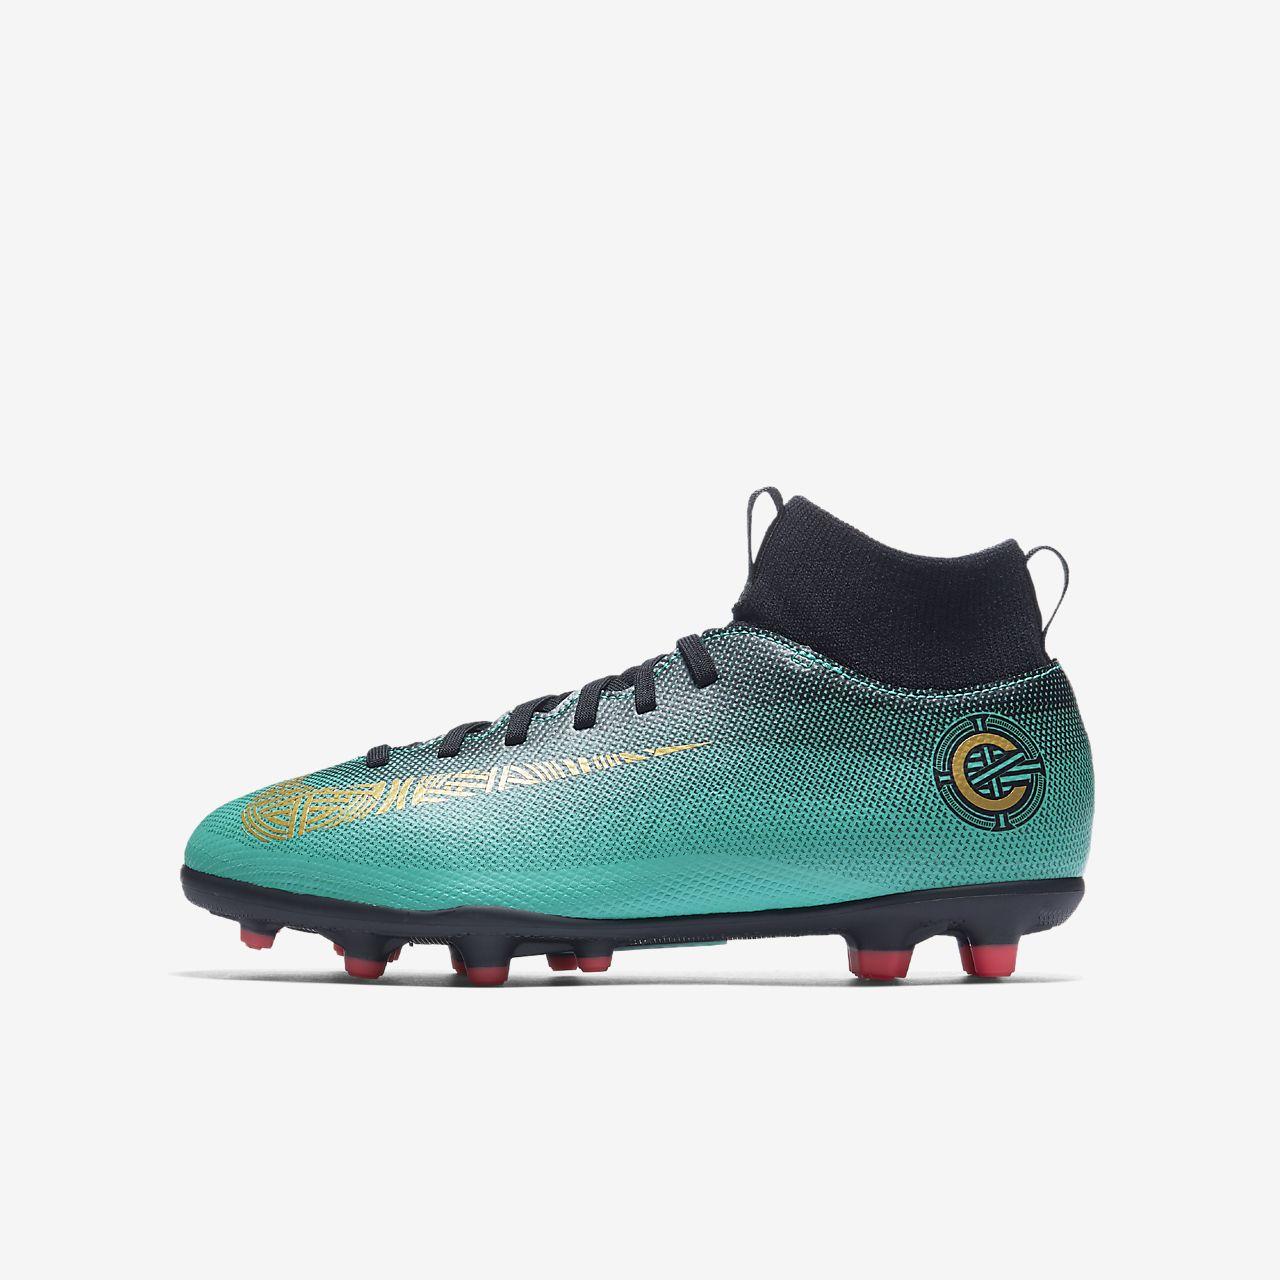 Acquista scarpe nike ronaldo - OFF44% sconti f53ff84794a